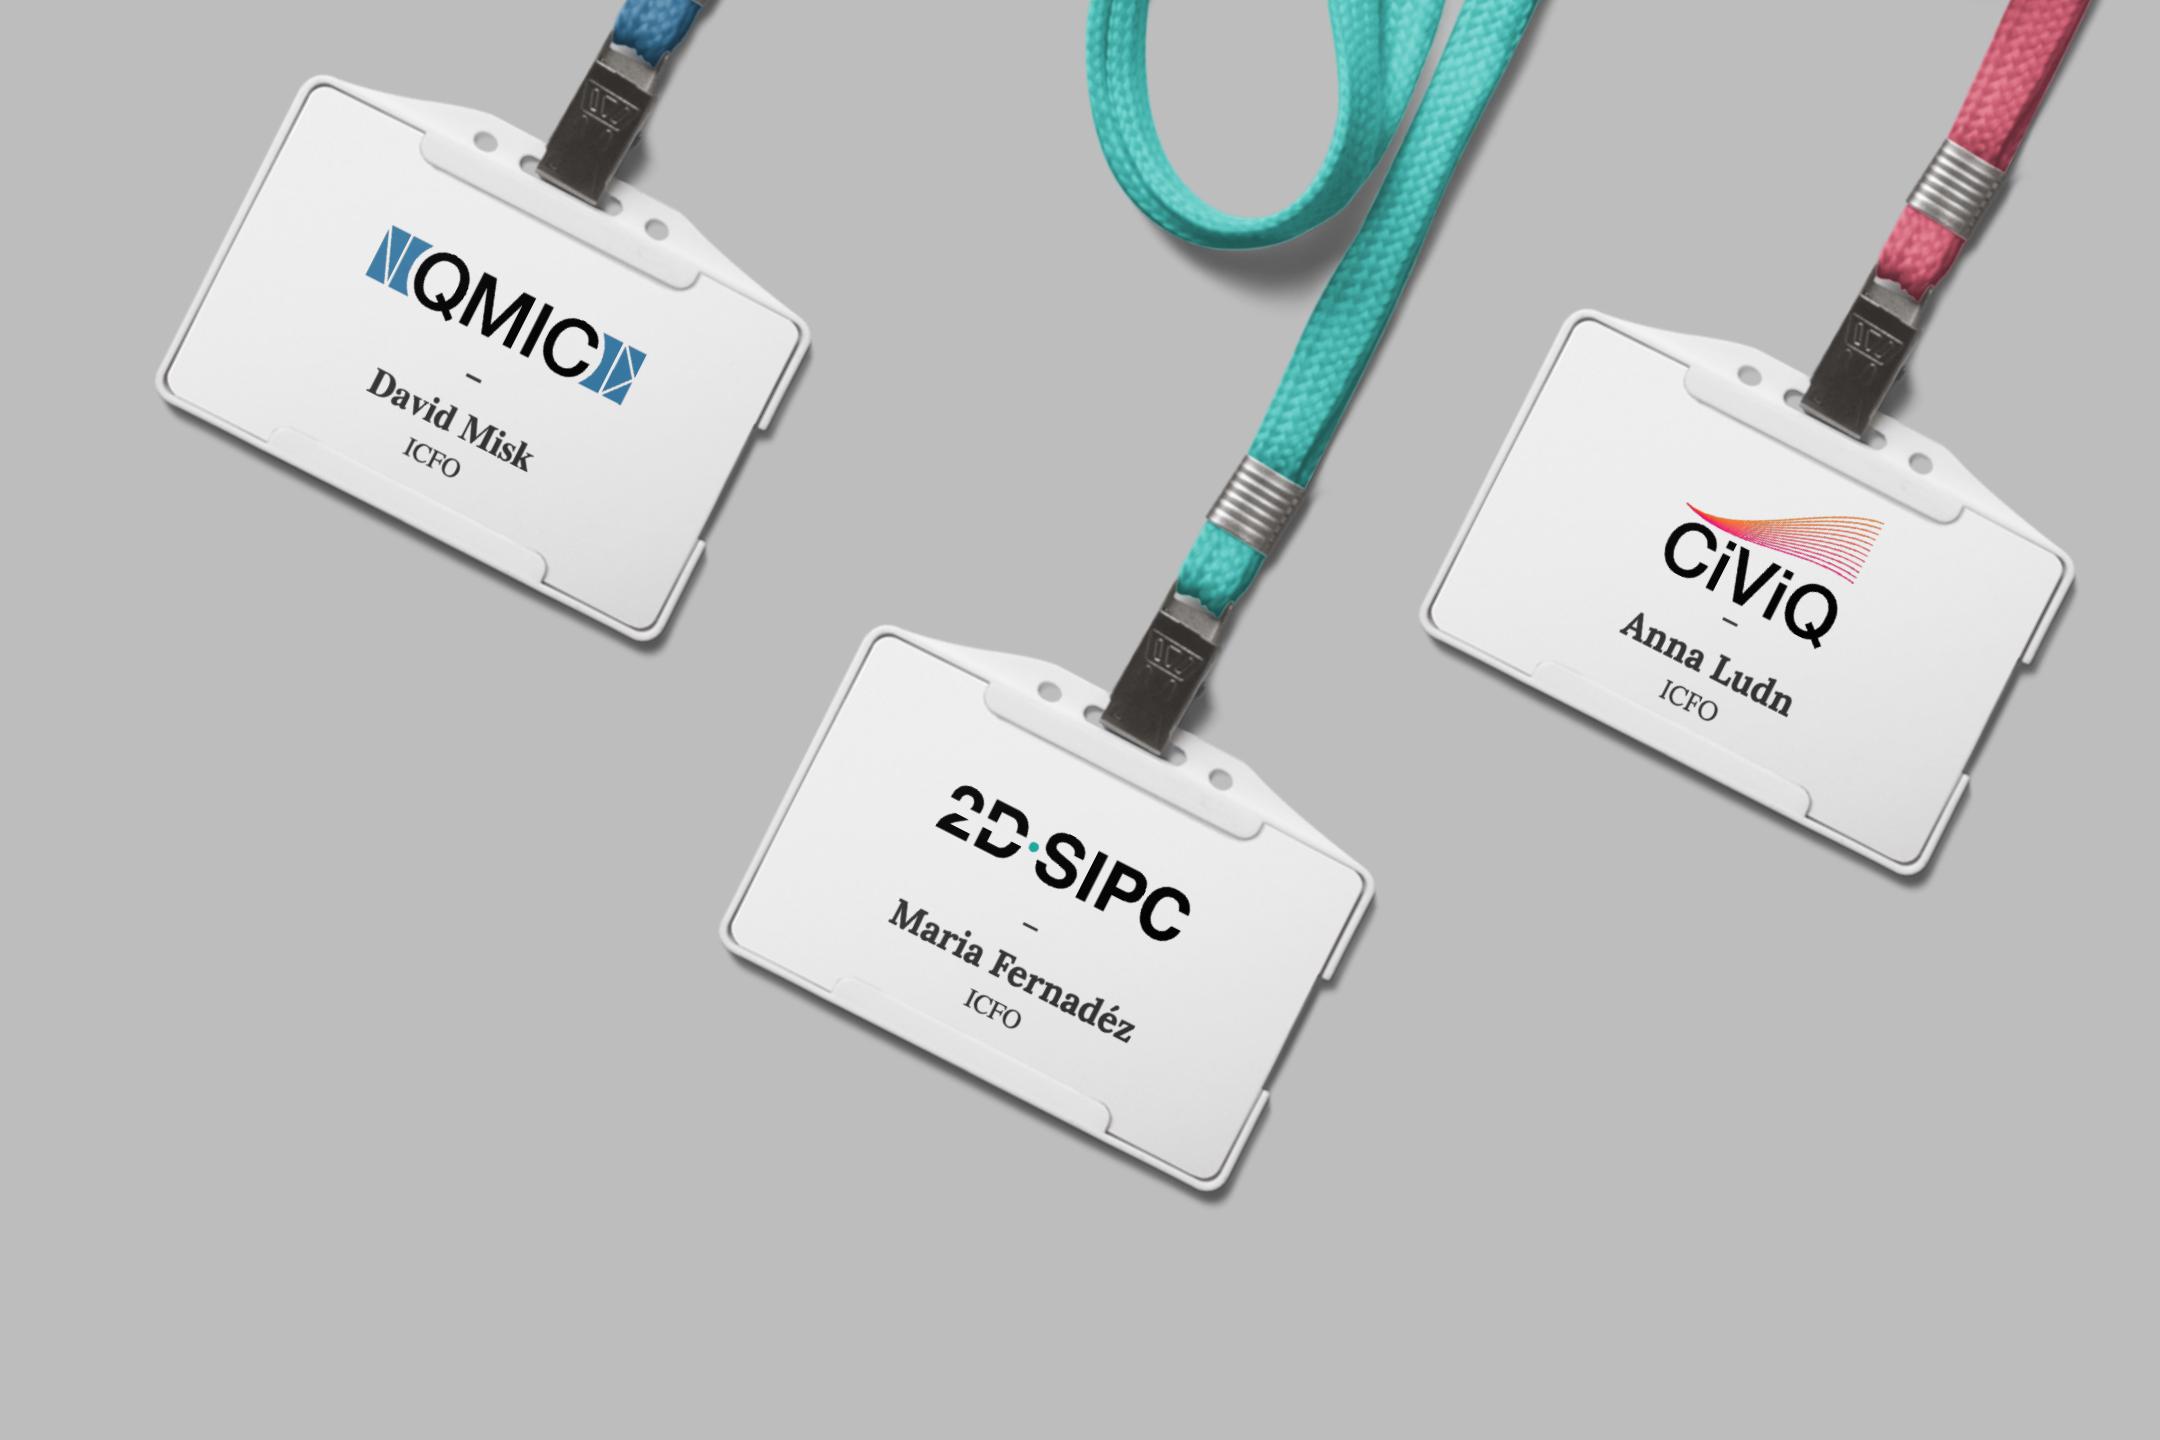 Logos-ICFO-Id-badge-Daniel-Cavalcanti